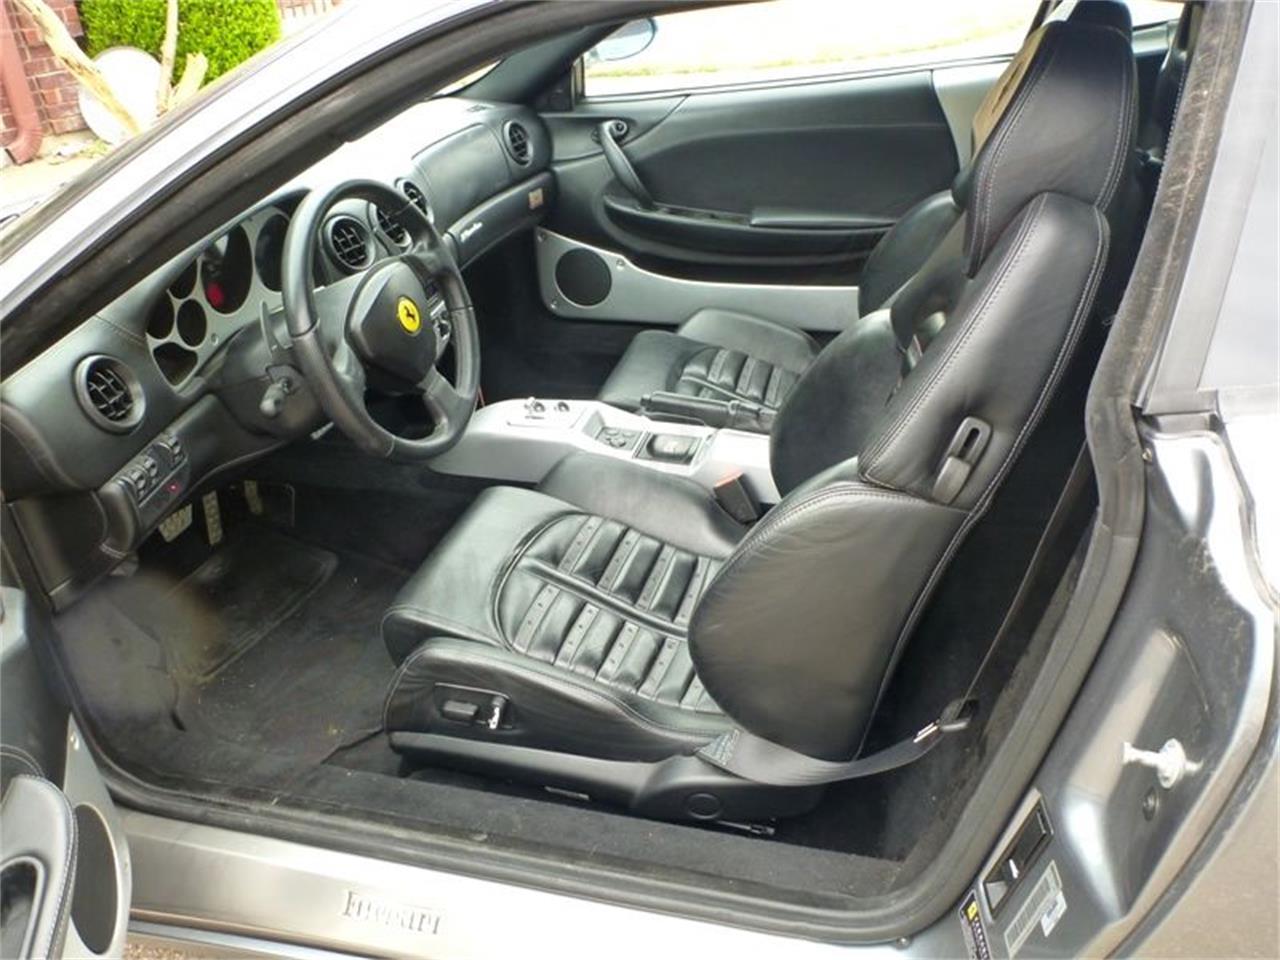 2004 Ferrari 360 (CC-1207498) for sale in Arlington, Texas